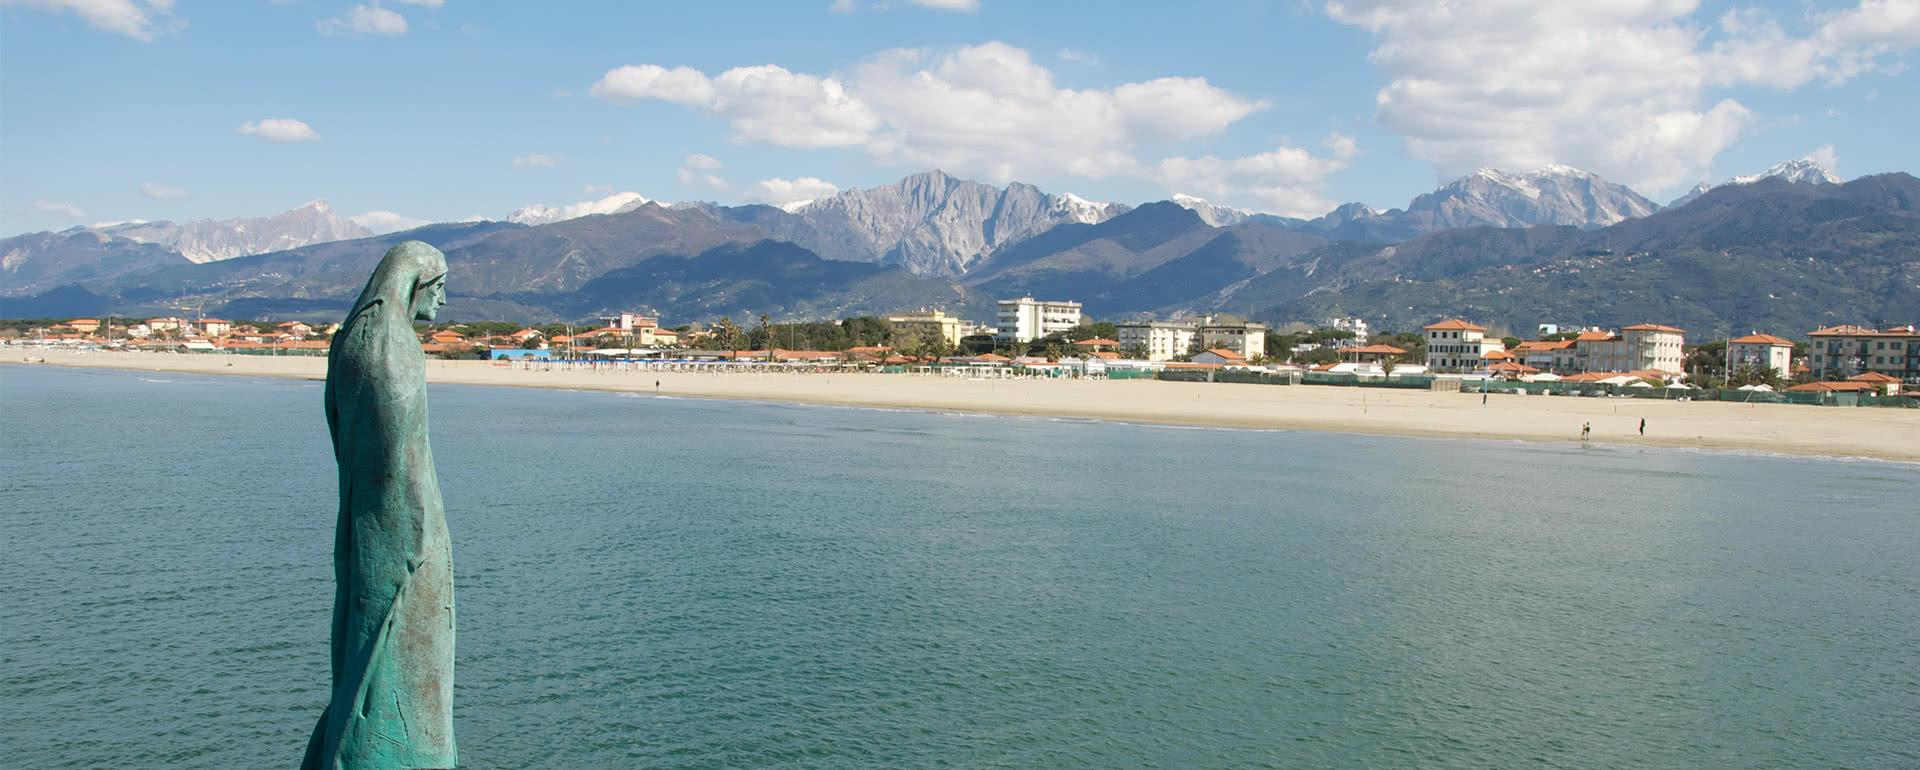 Titelbild von Marina di Pietrasanta